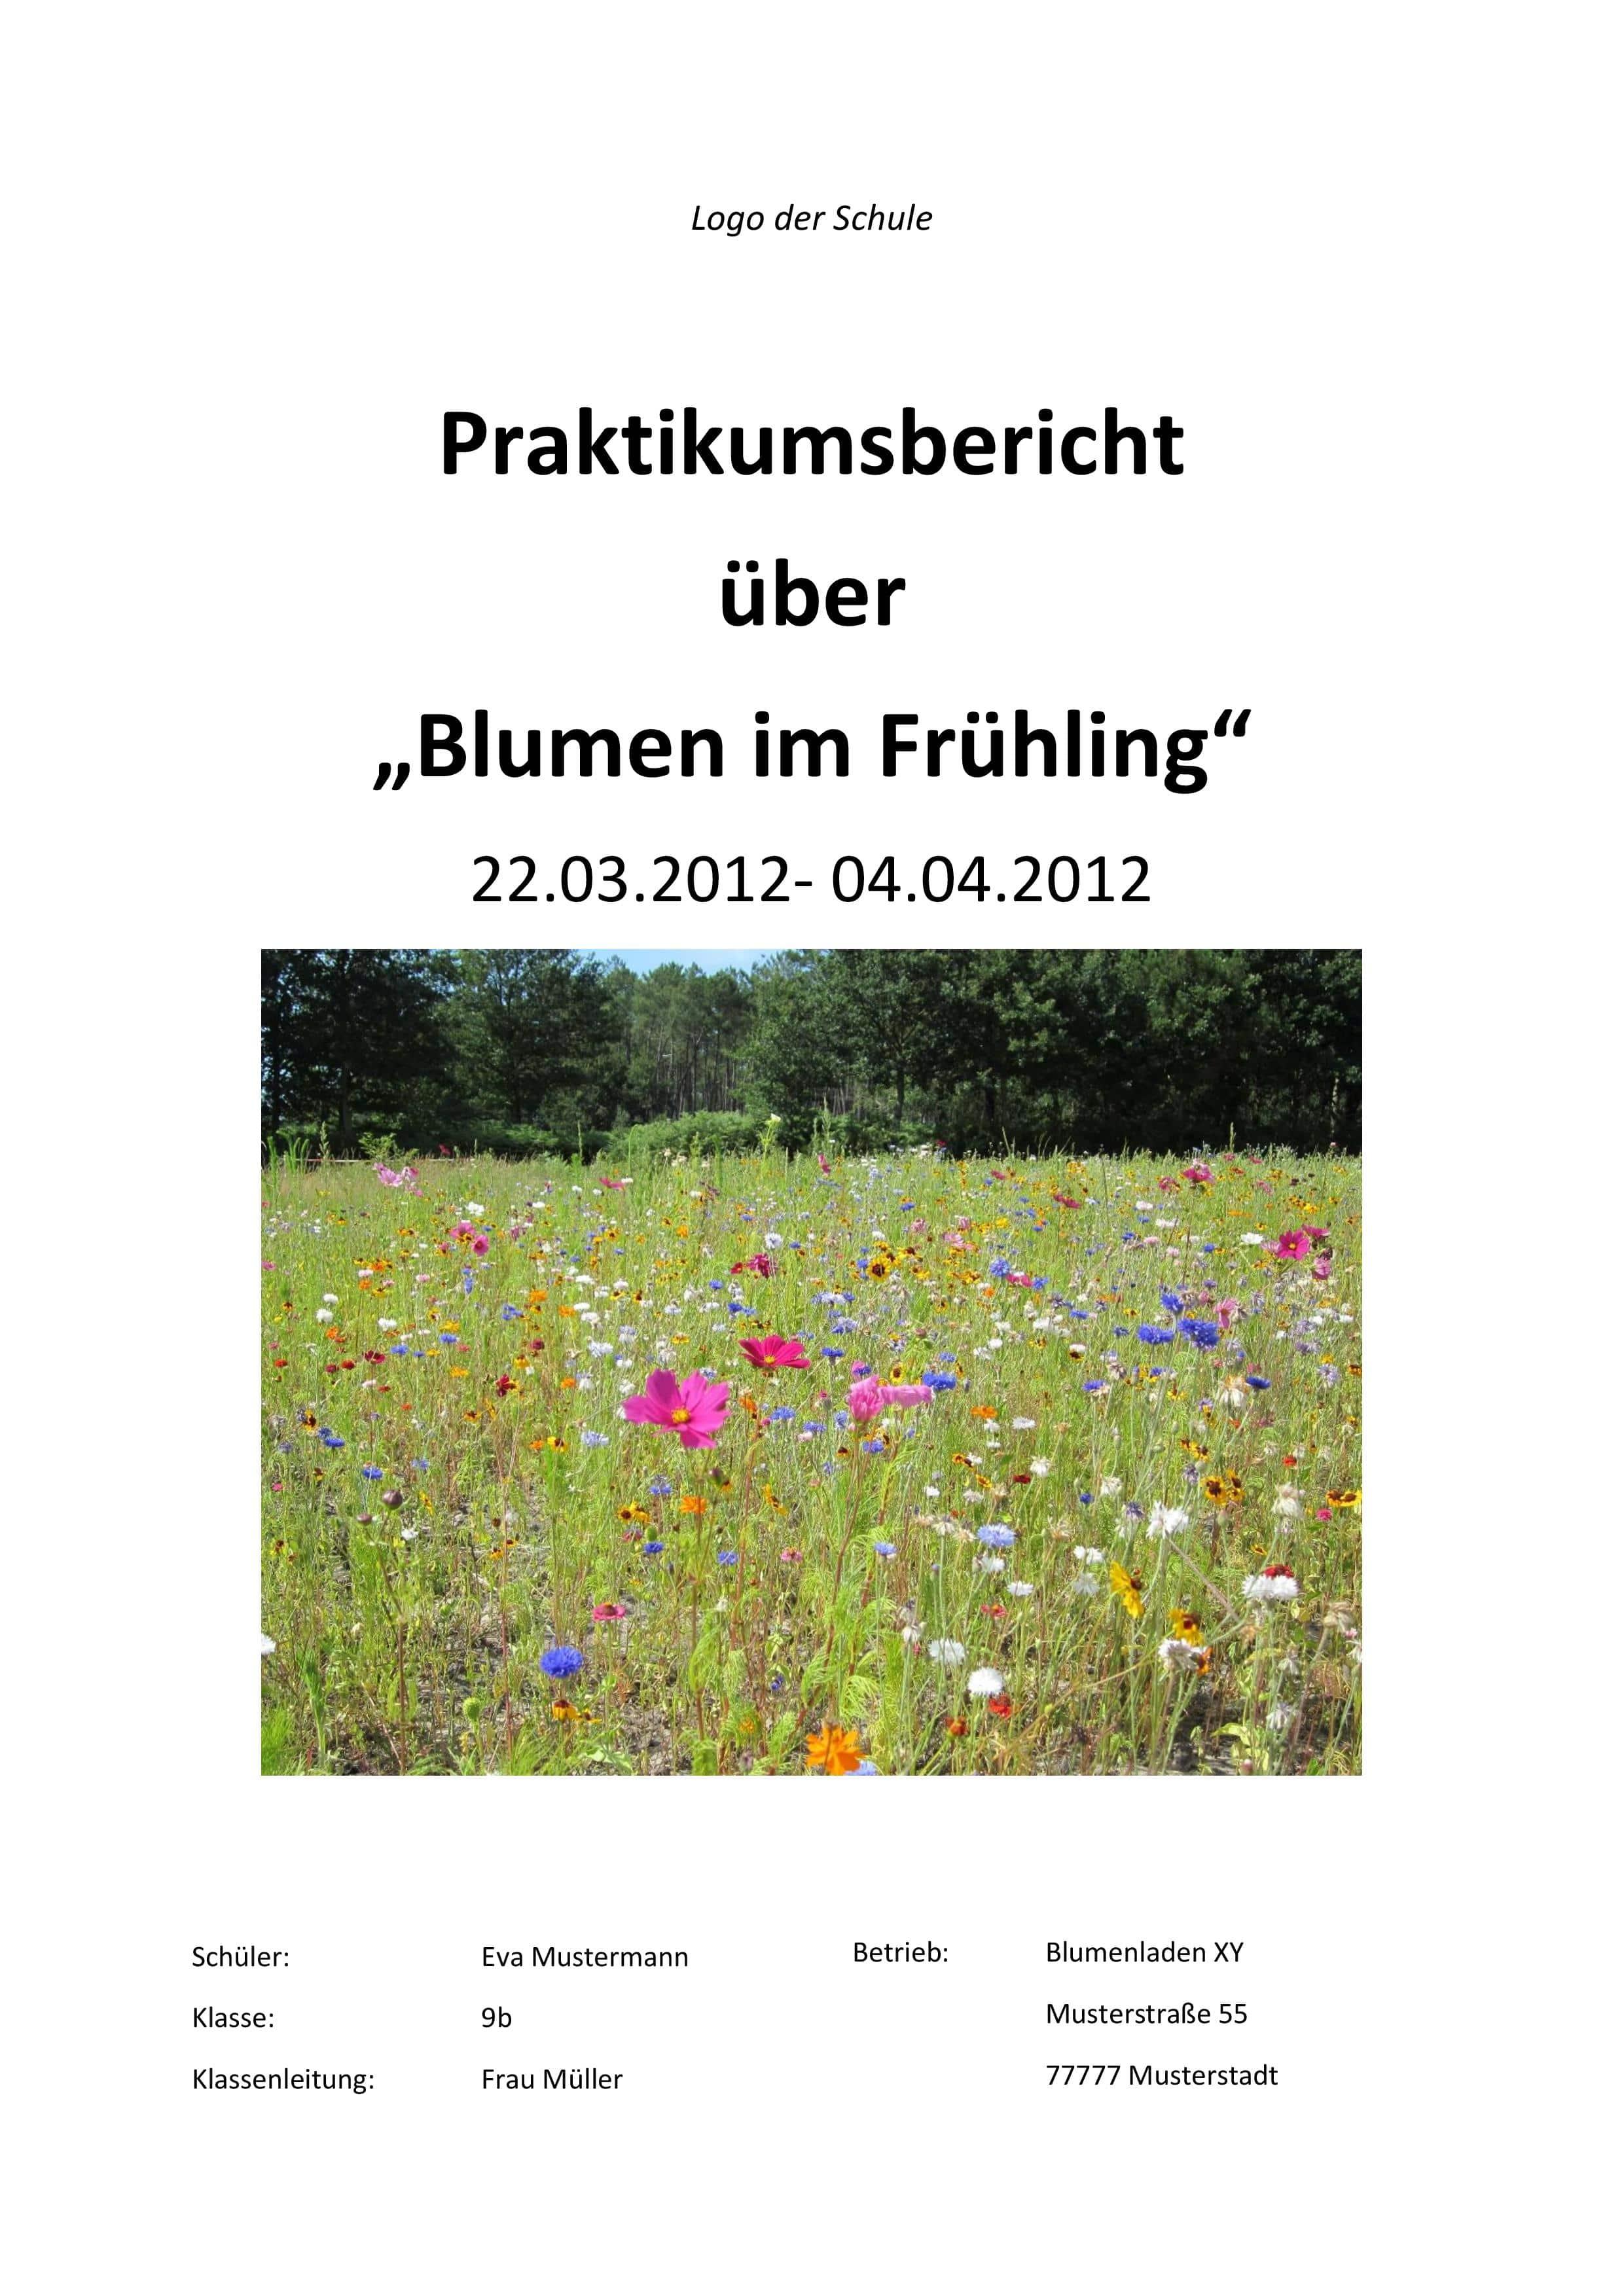 Deckblatt Praktikumsbericht Blumenladen